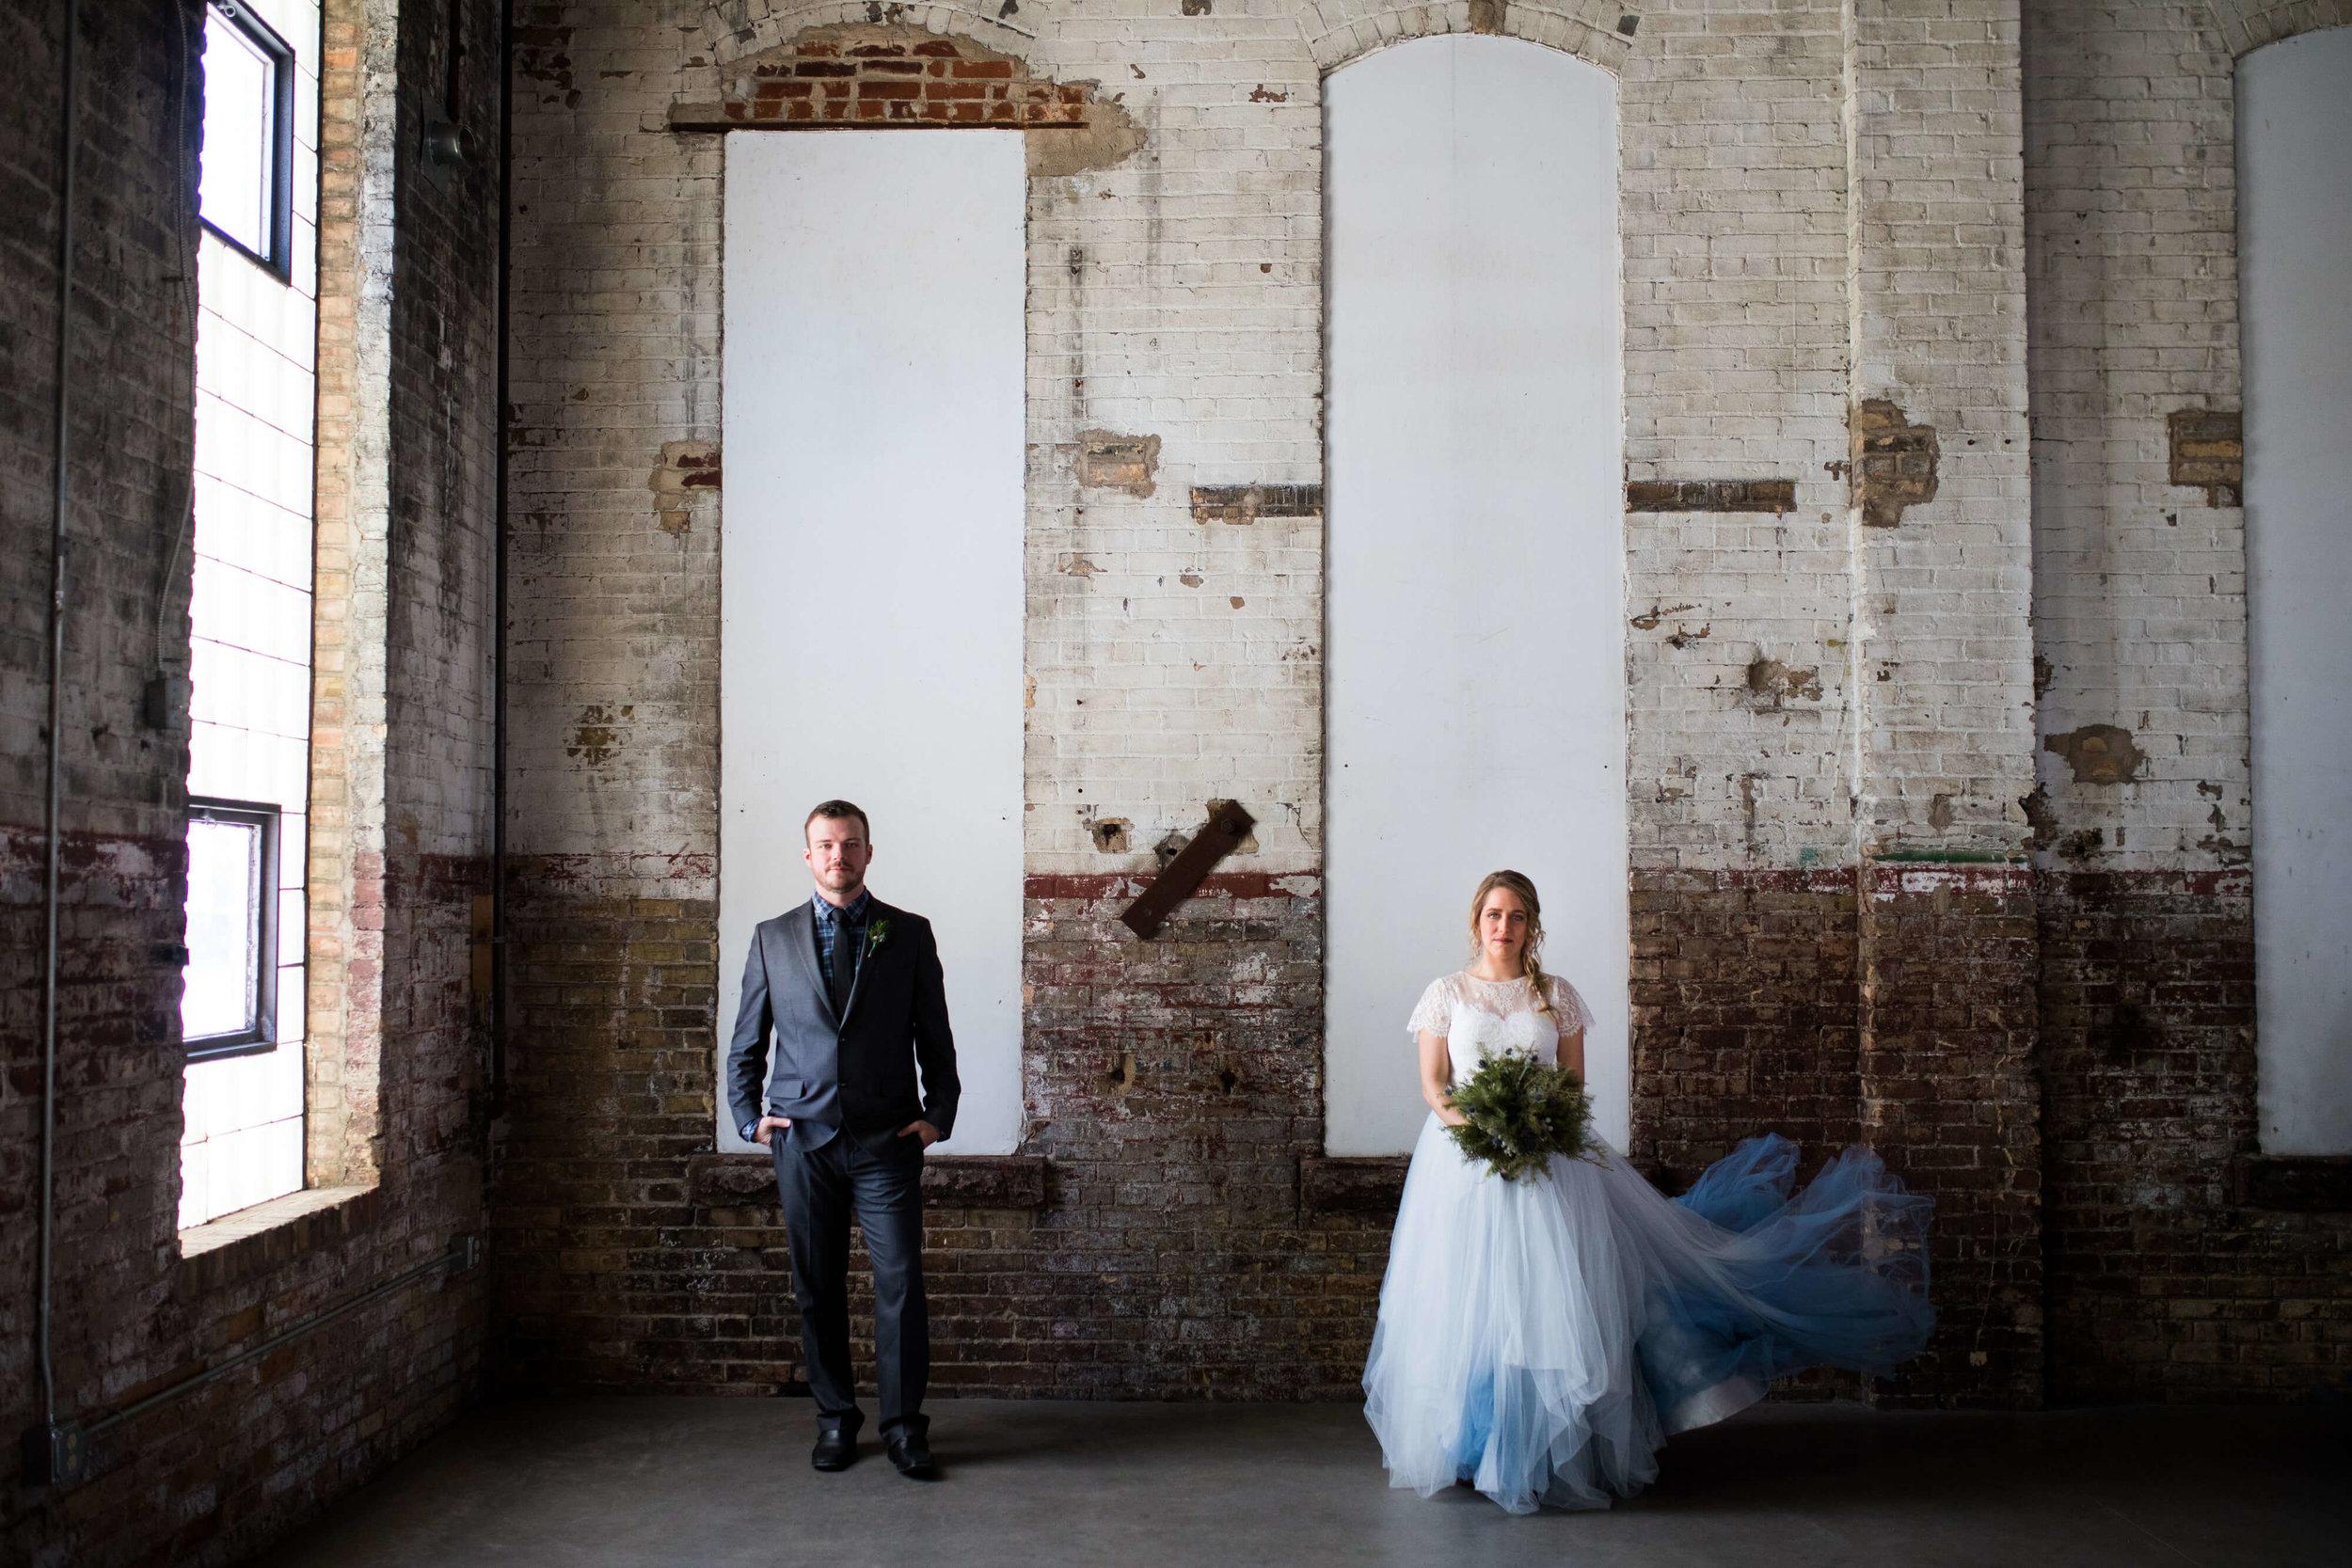 NP event space | blue tulle wedding dress | Minnesota wedding photographer Studio KH wedding dress details | wedding blog | Sixpence Events 70 Ways to Photograph Your Wedding Dress.jpg